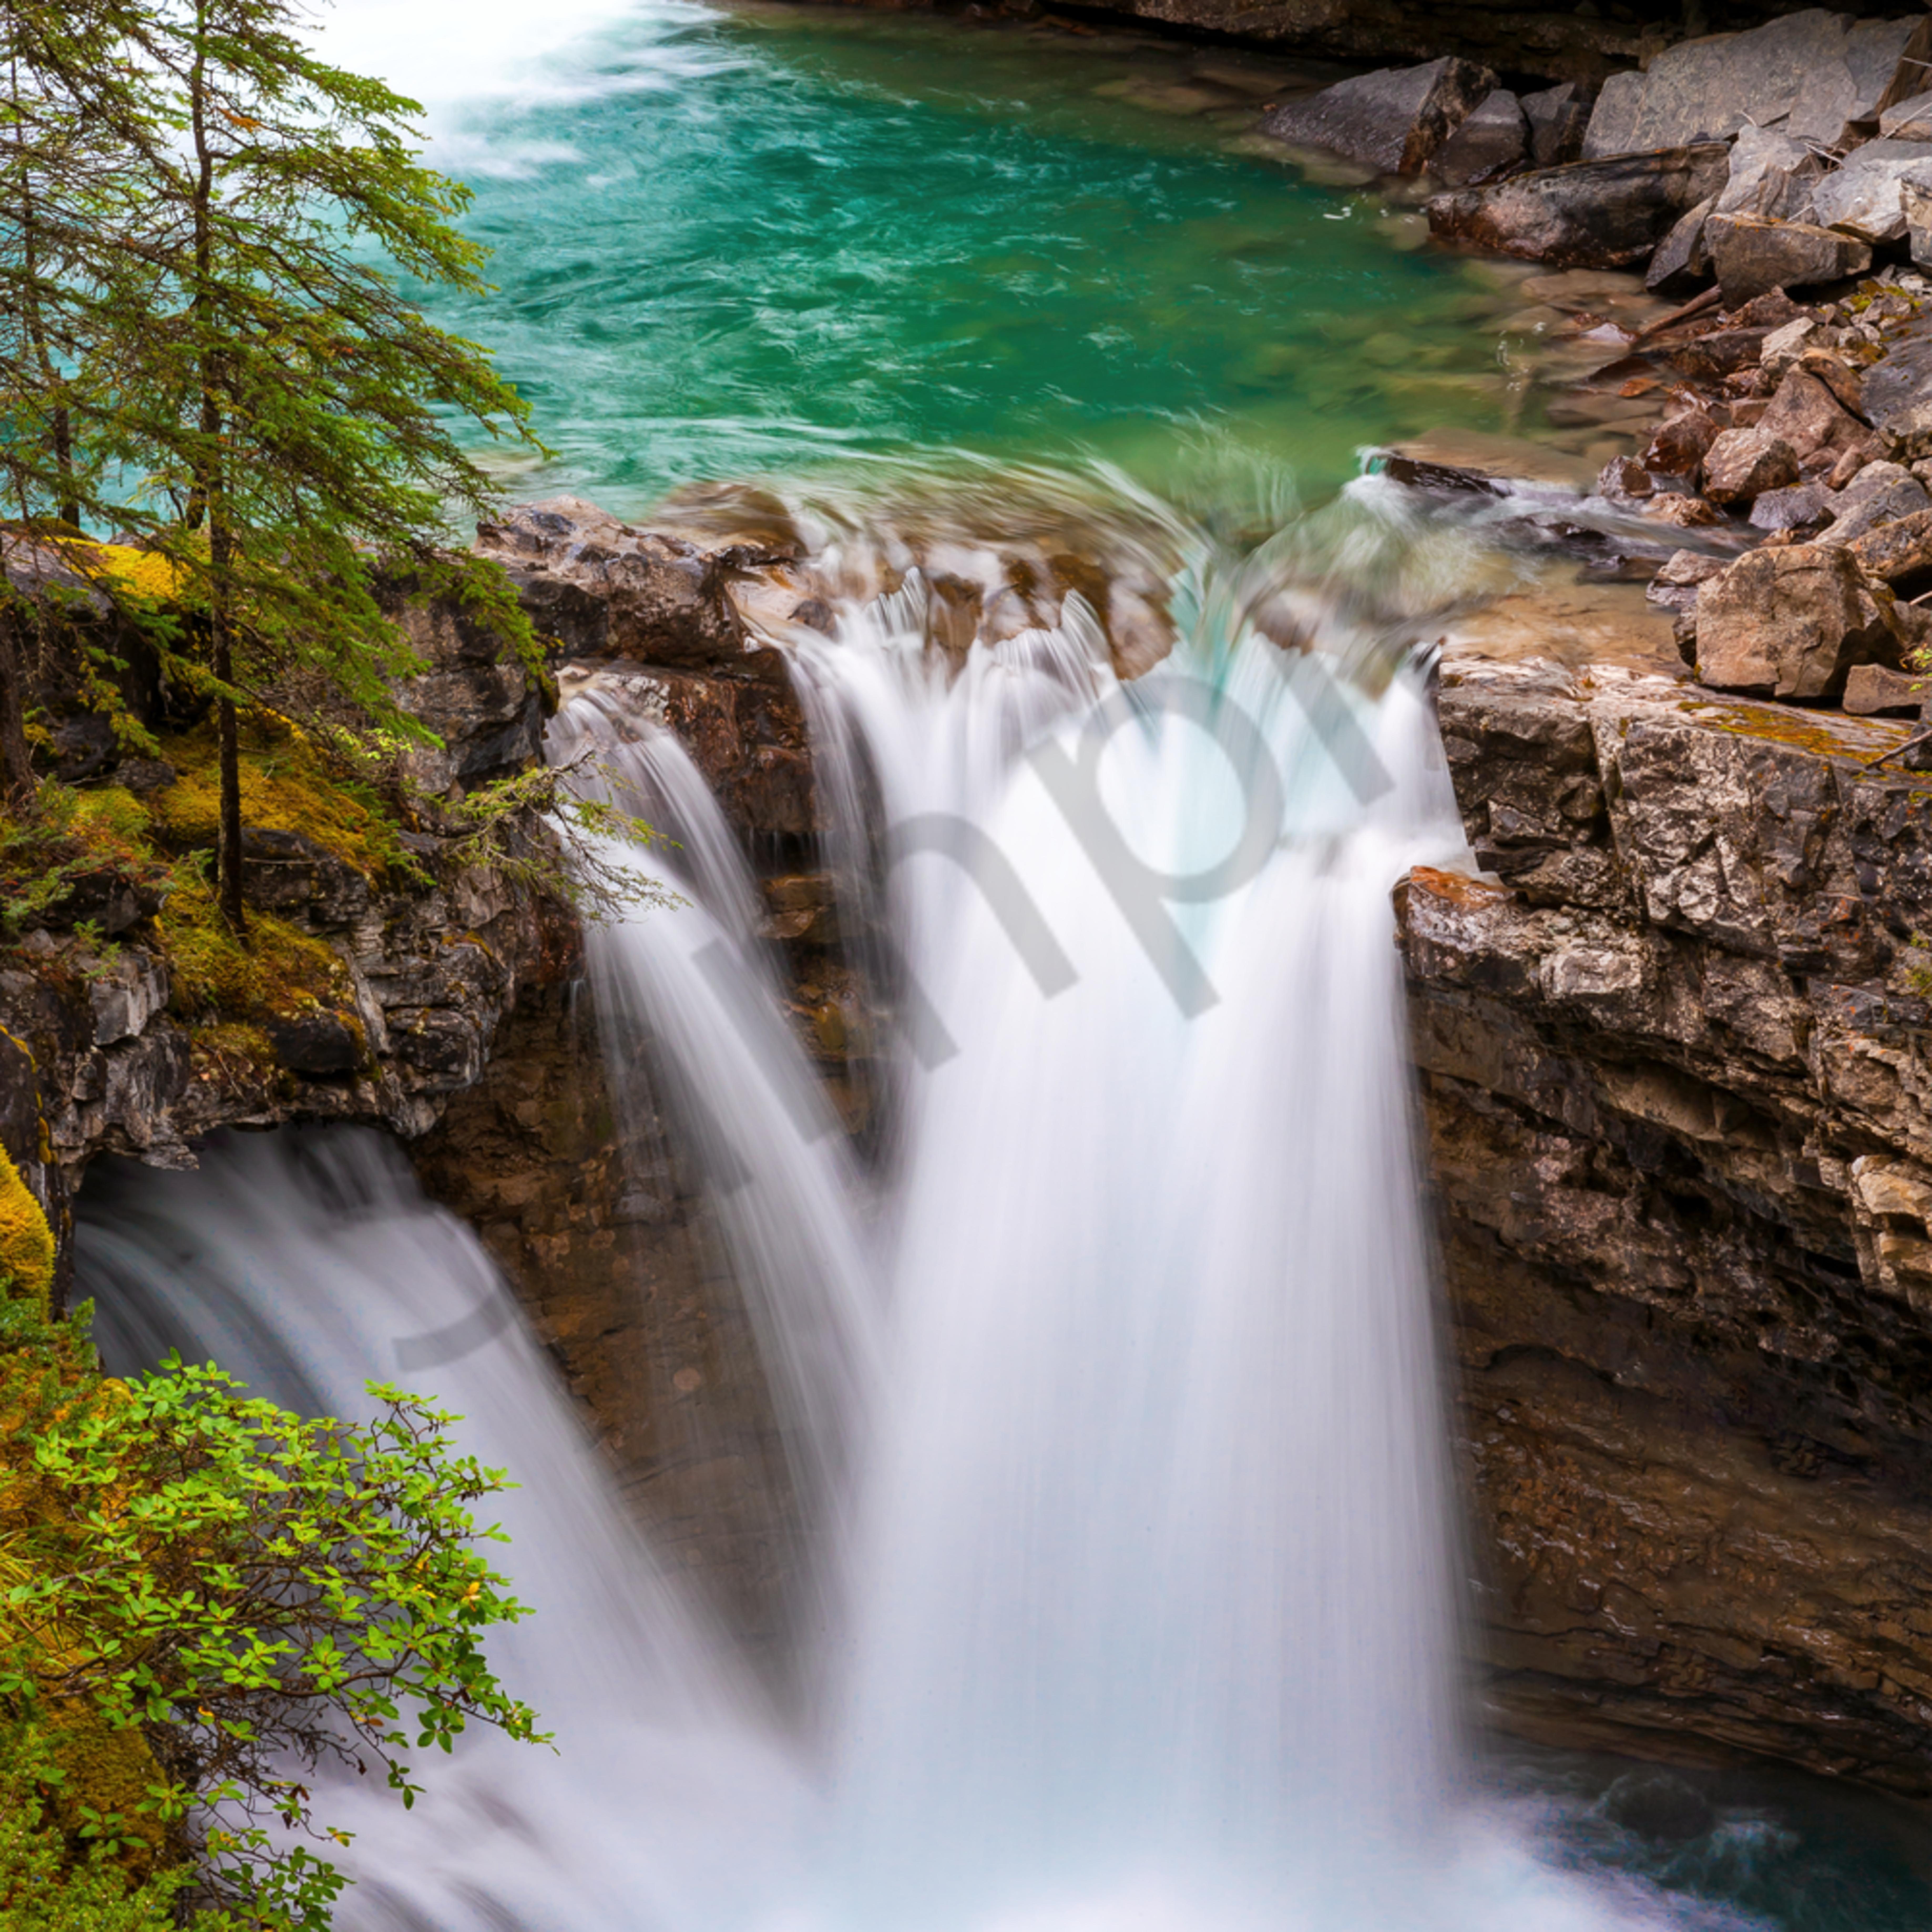 Waterfalls and banff national park alberta canada. dqvx9g